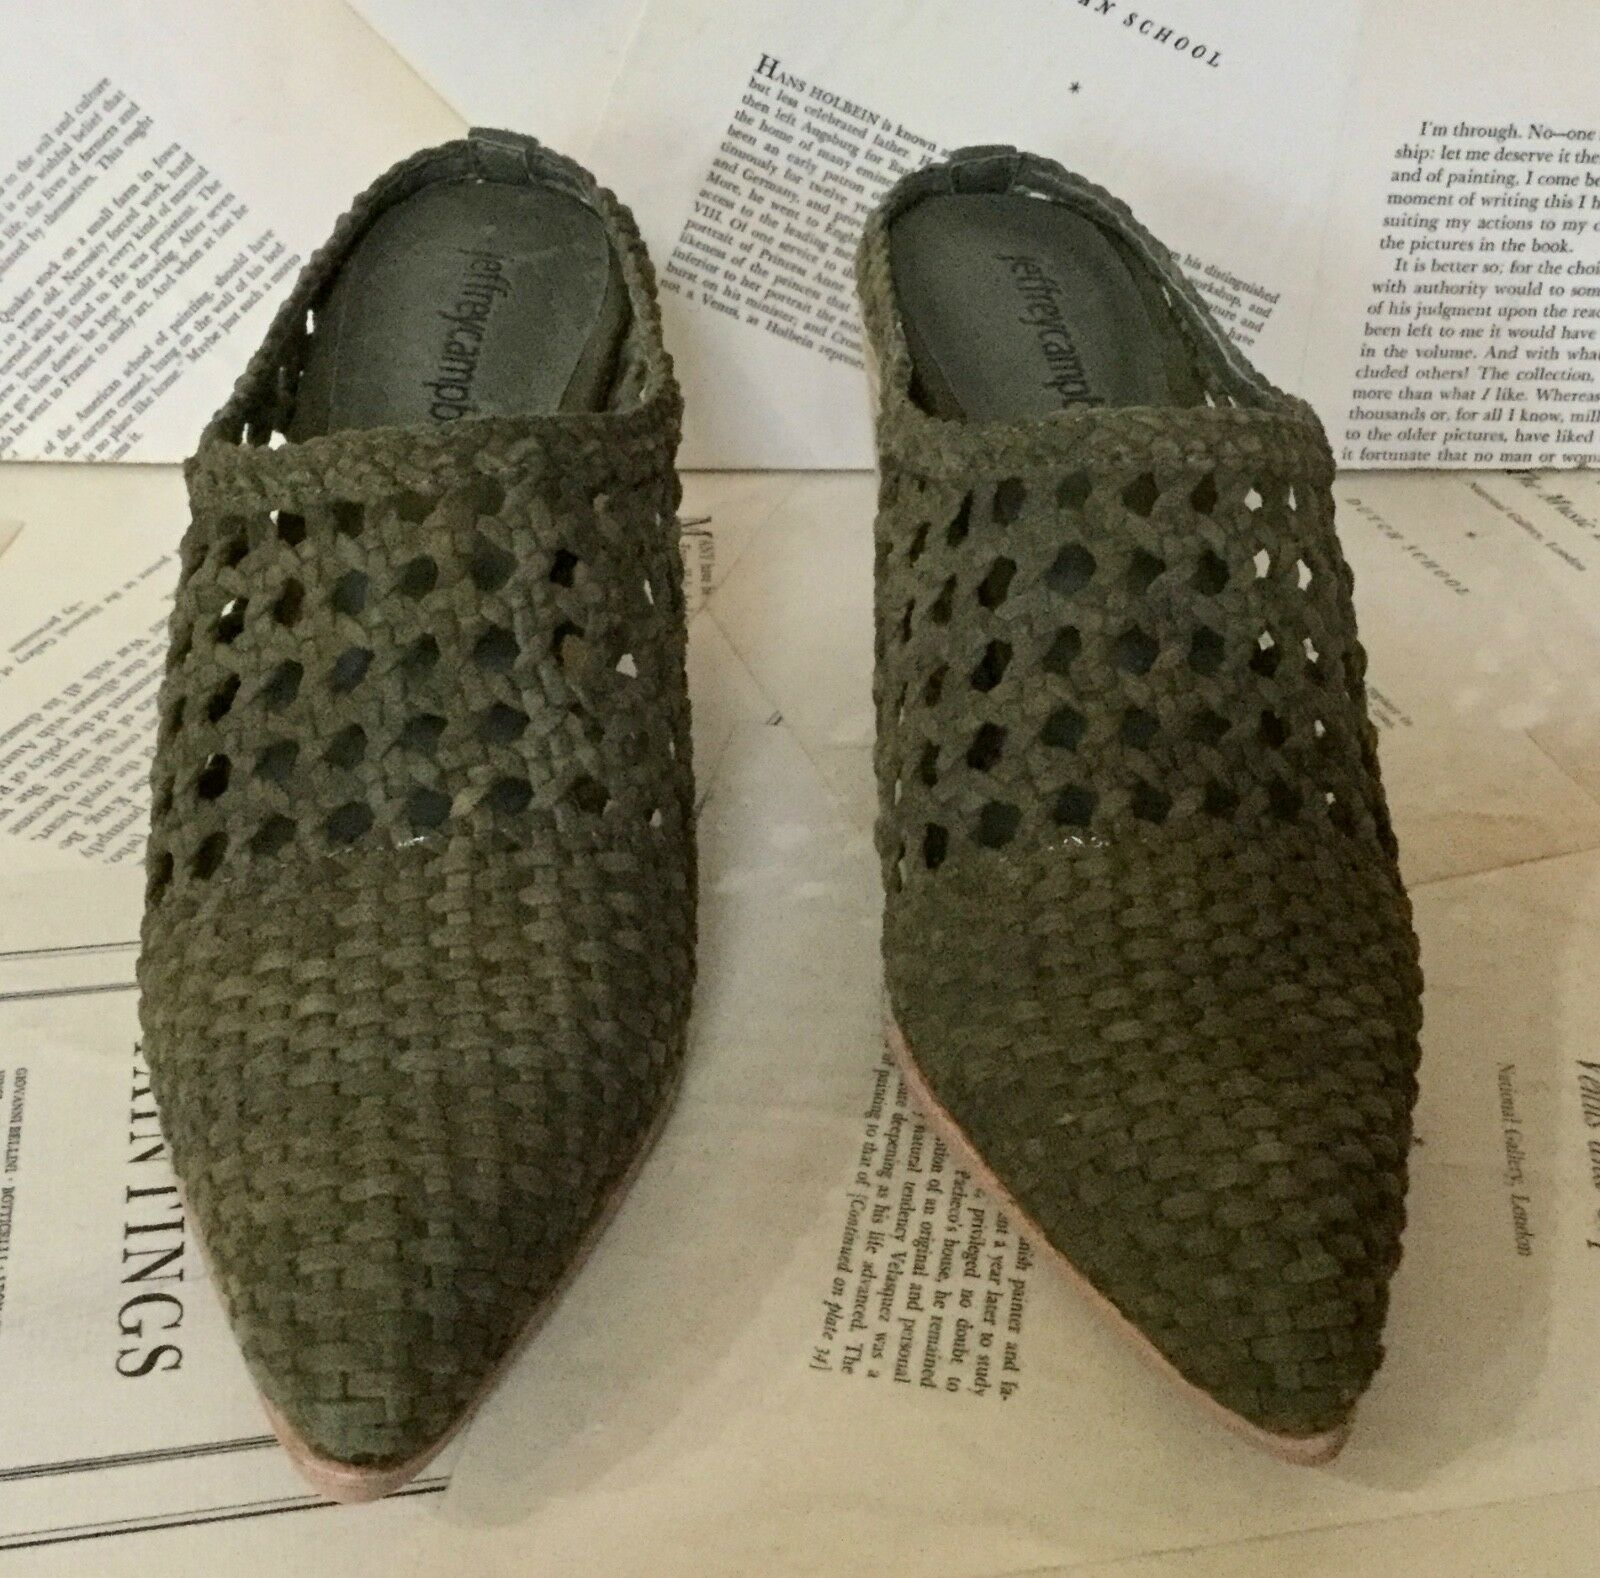 NIB Anthropologie Campbell Jeffrey Campbell Anthropologie olive Suede Weaved Western Mule Bootie 8.5 1da7f4